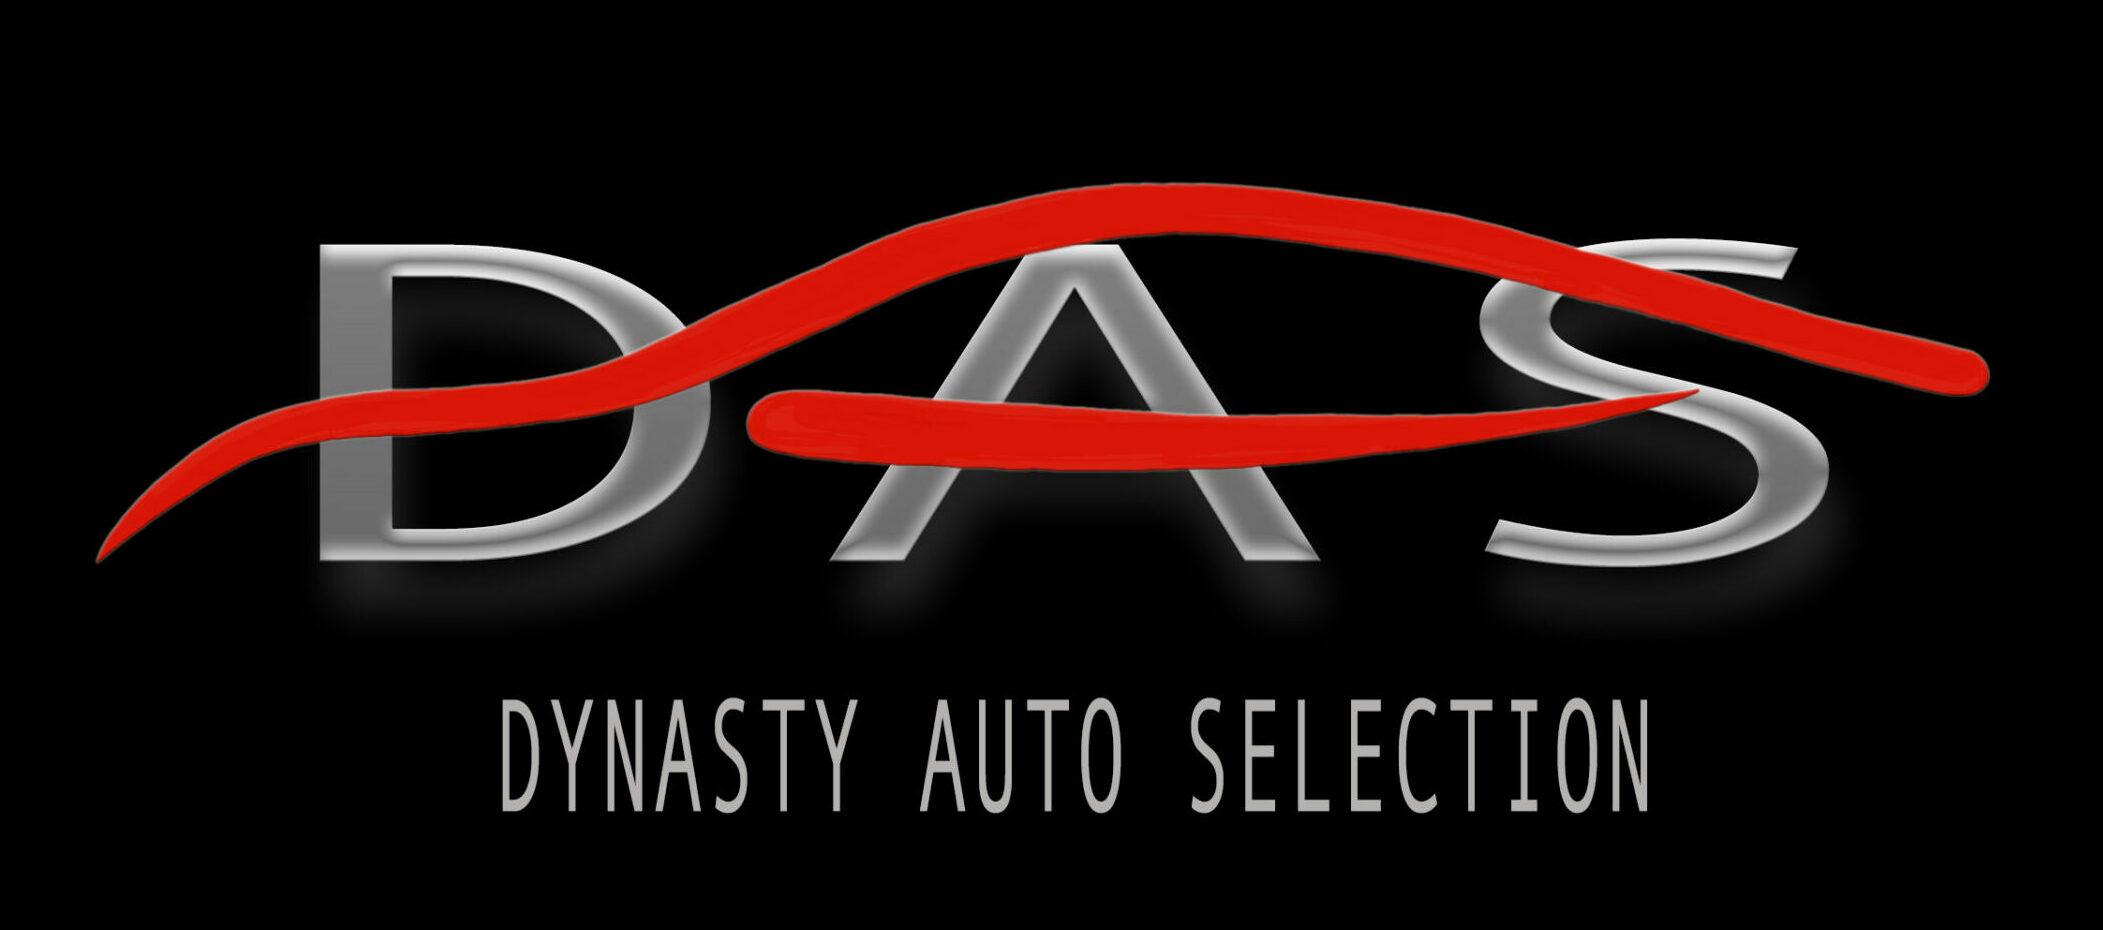 Dynasty Auto Selection logo